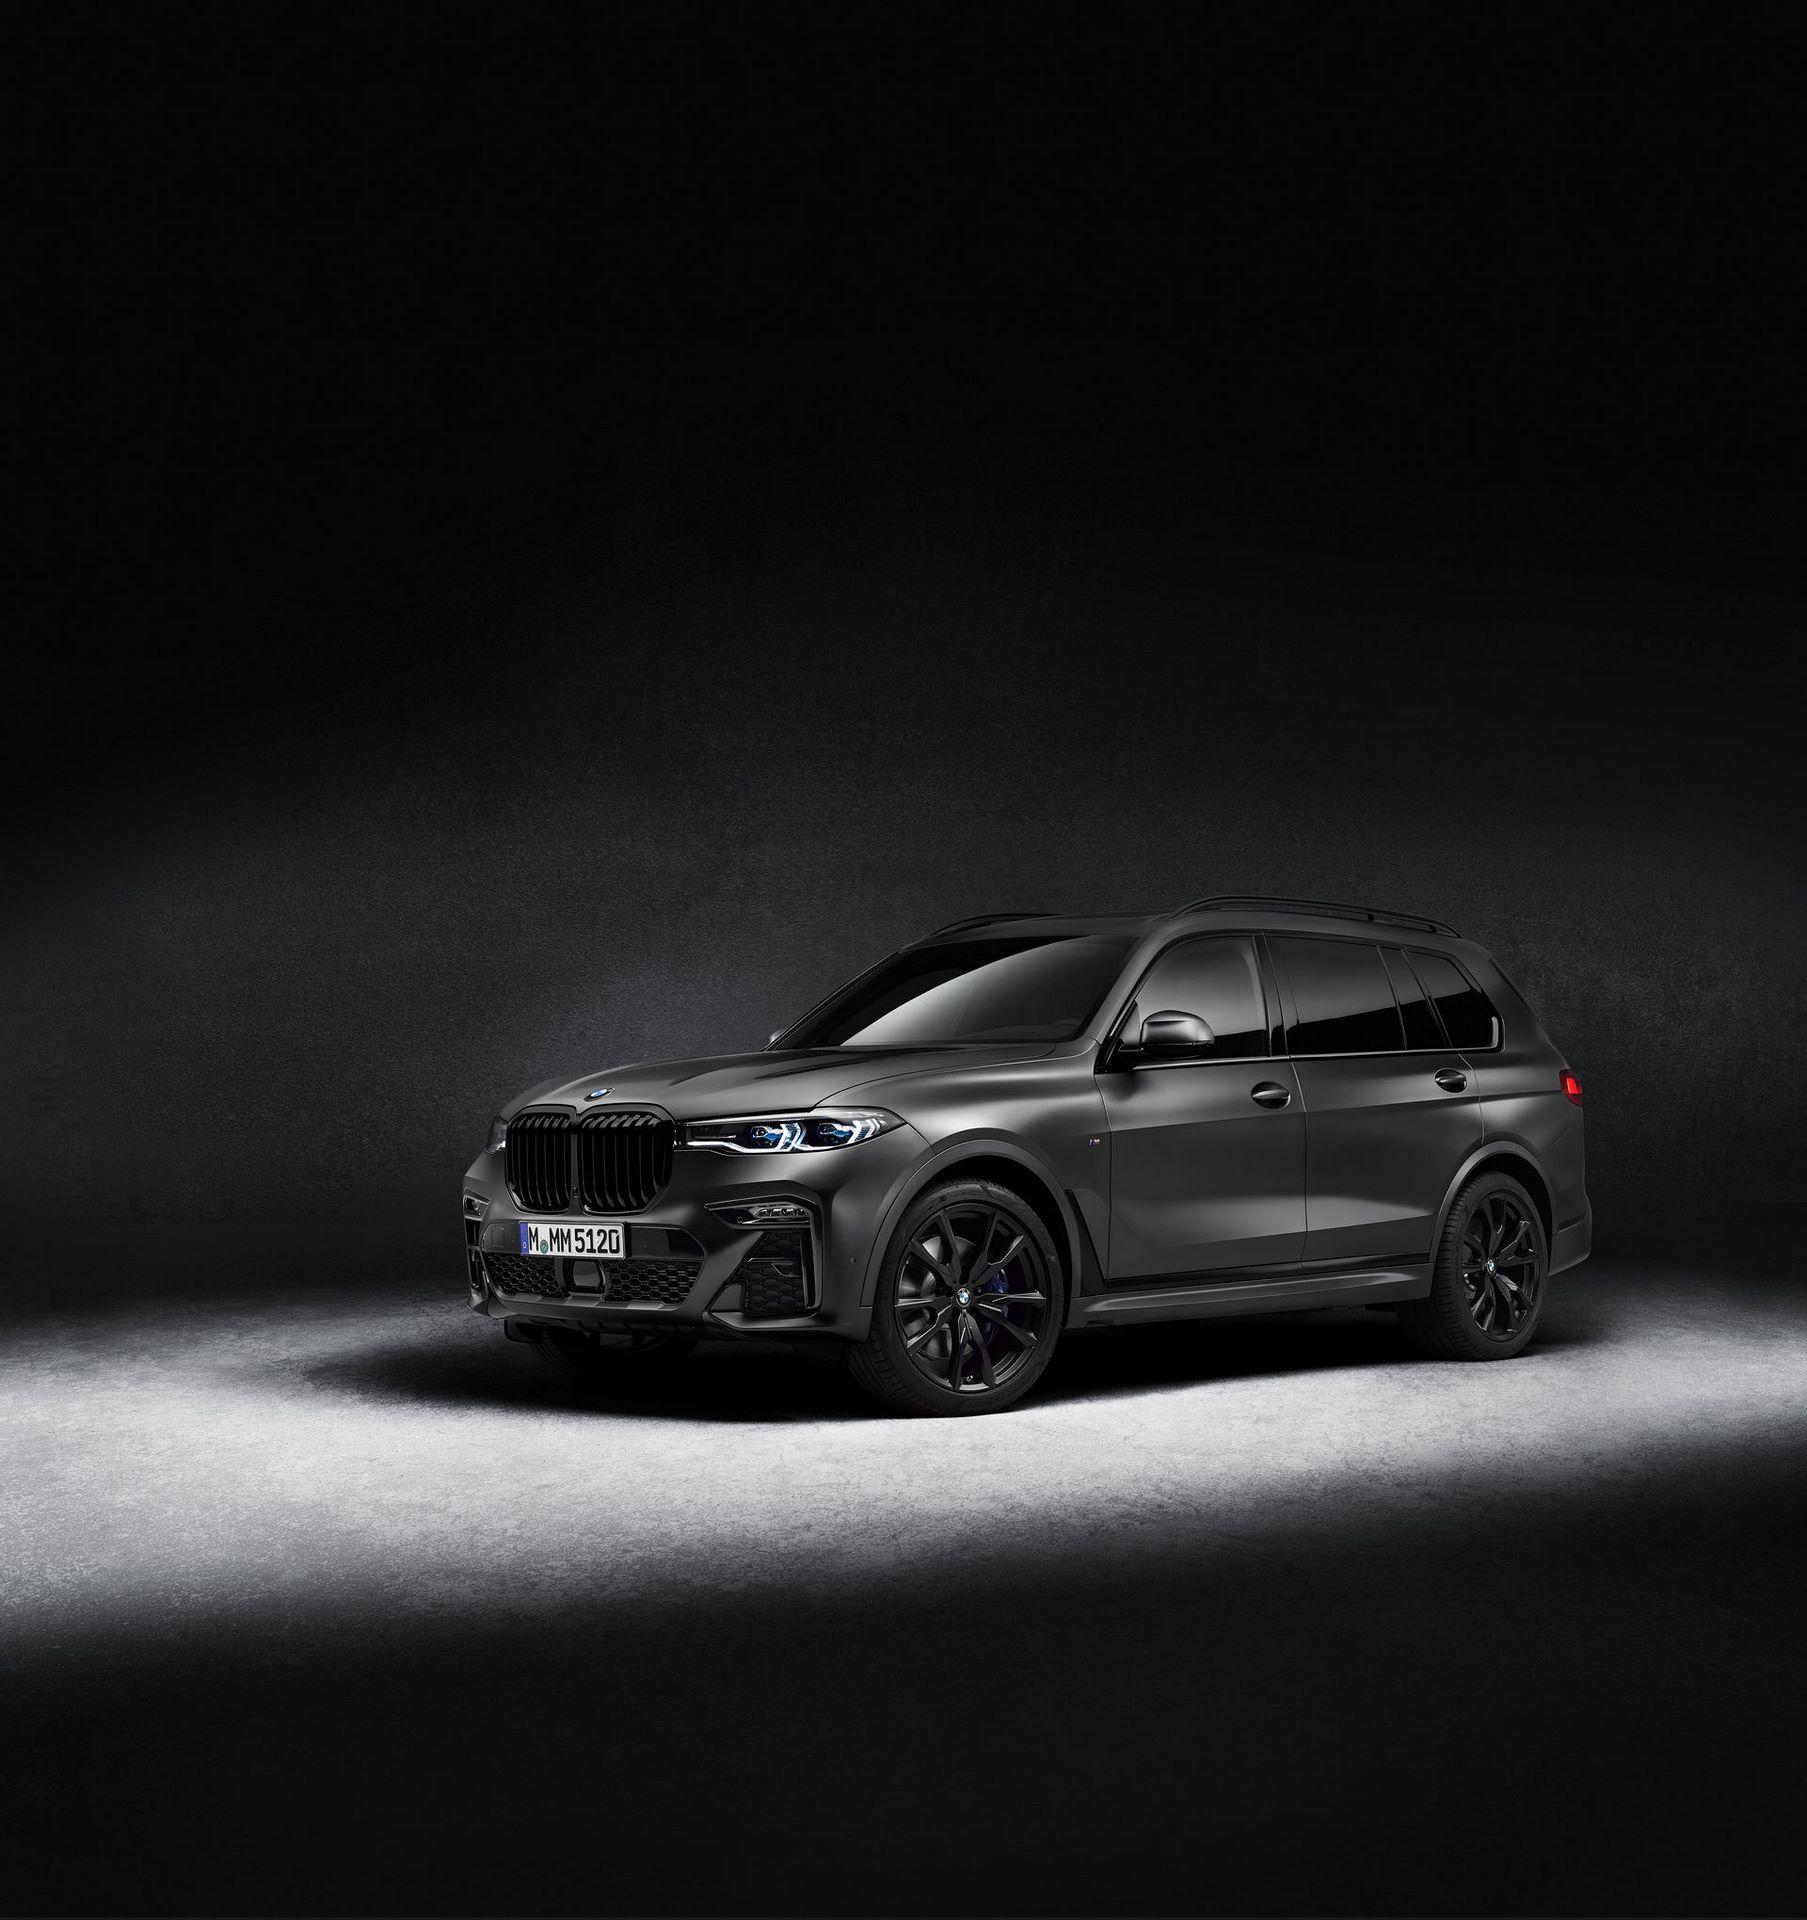 BMW-X7-Dark-Shadow-Edition-7